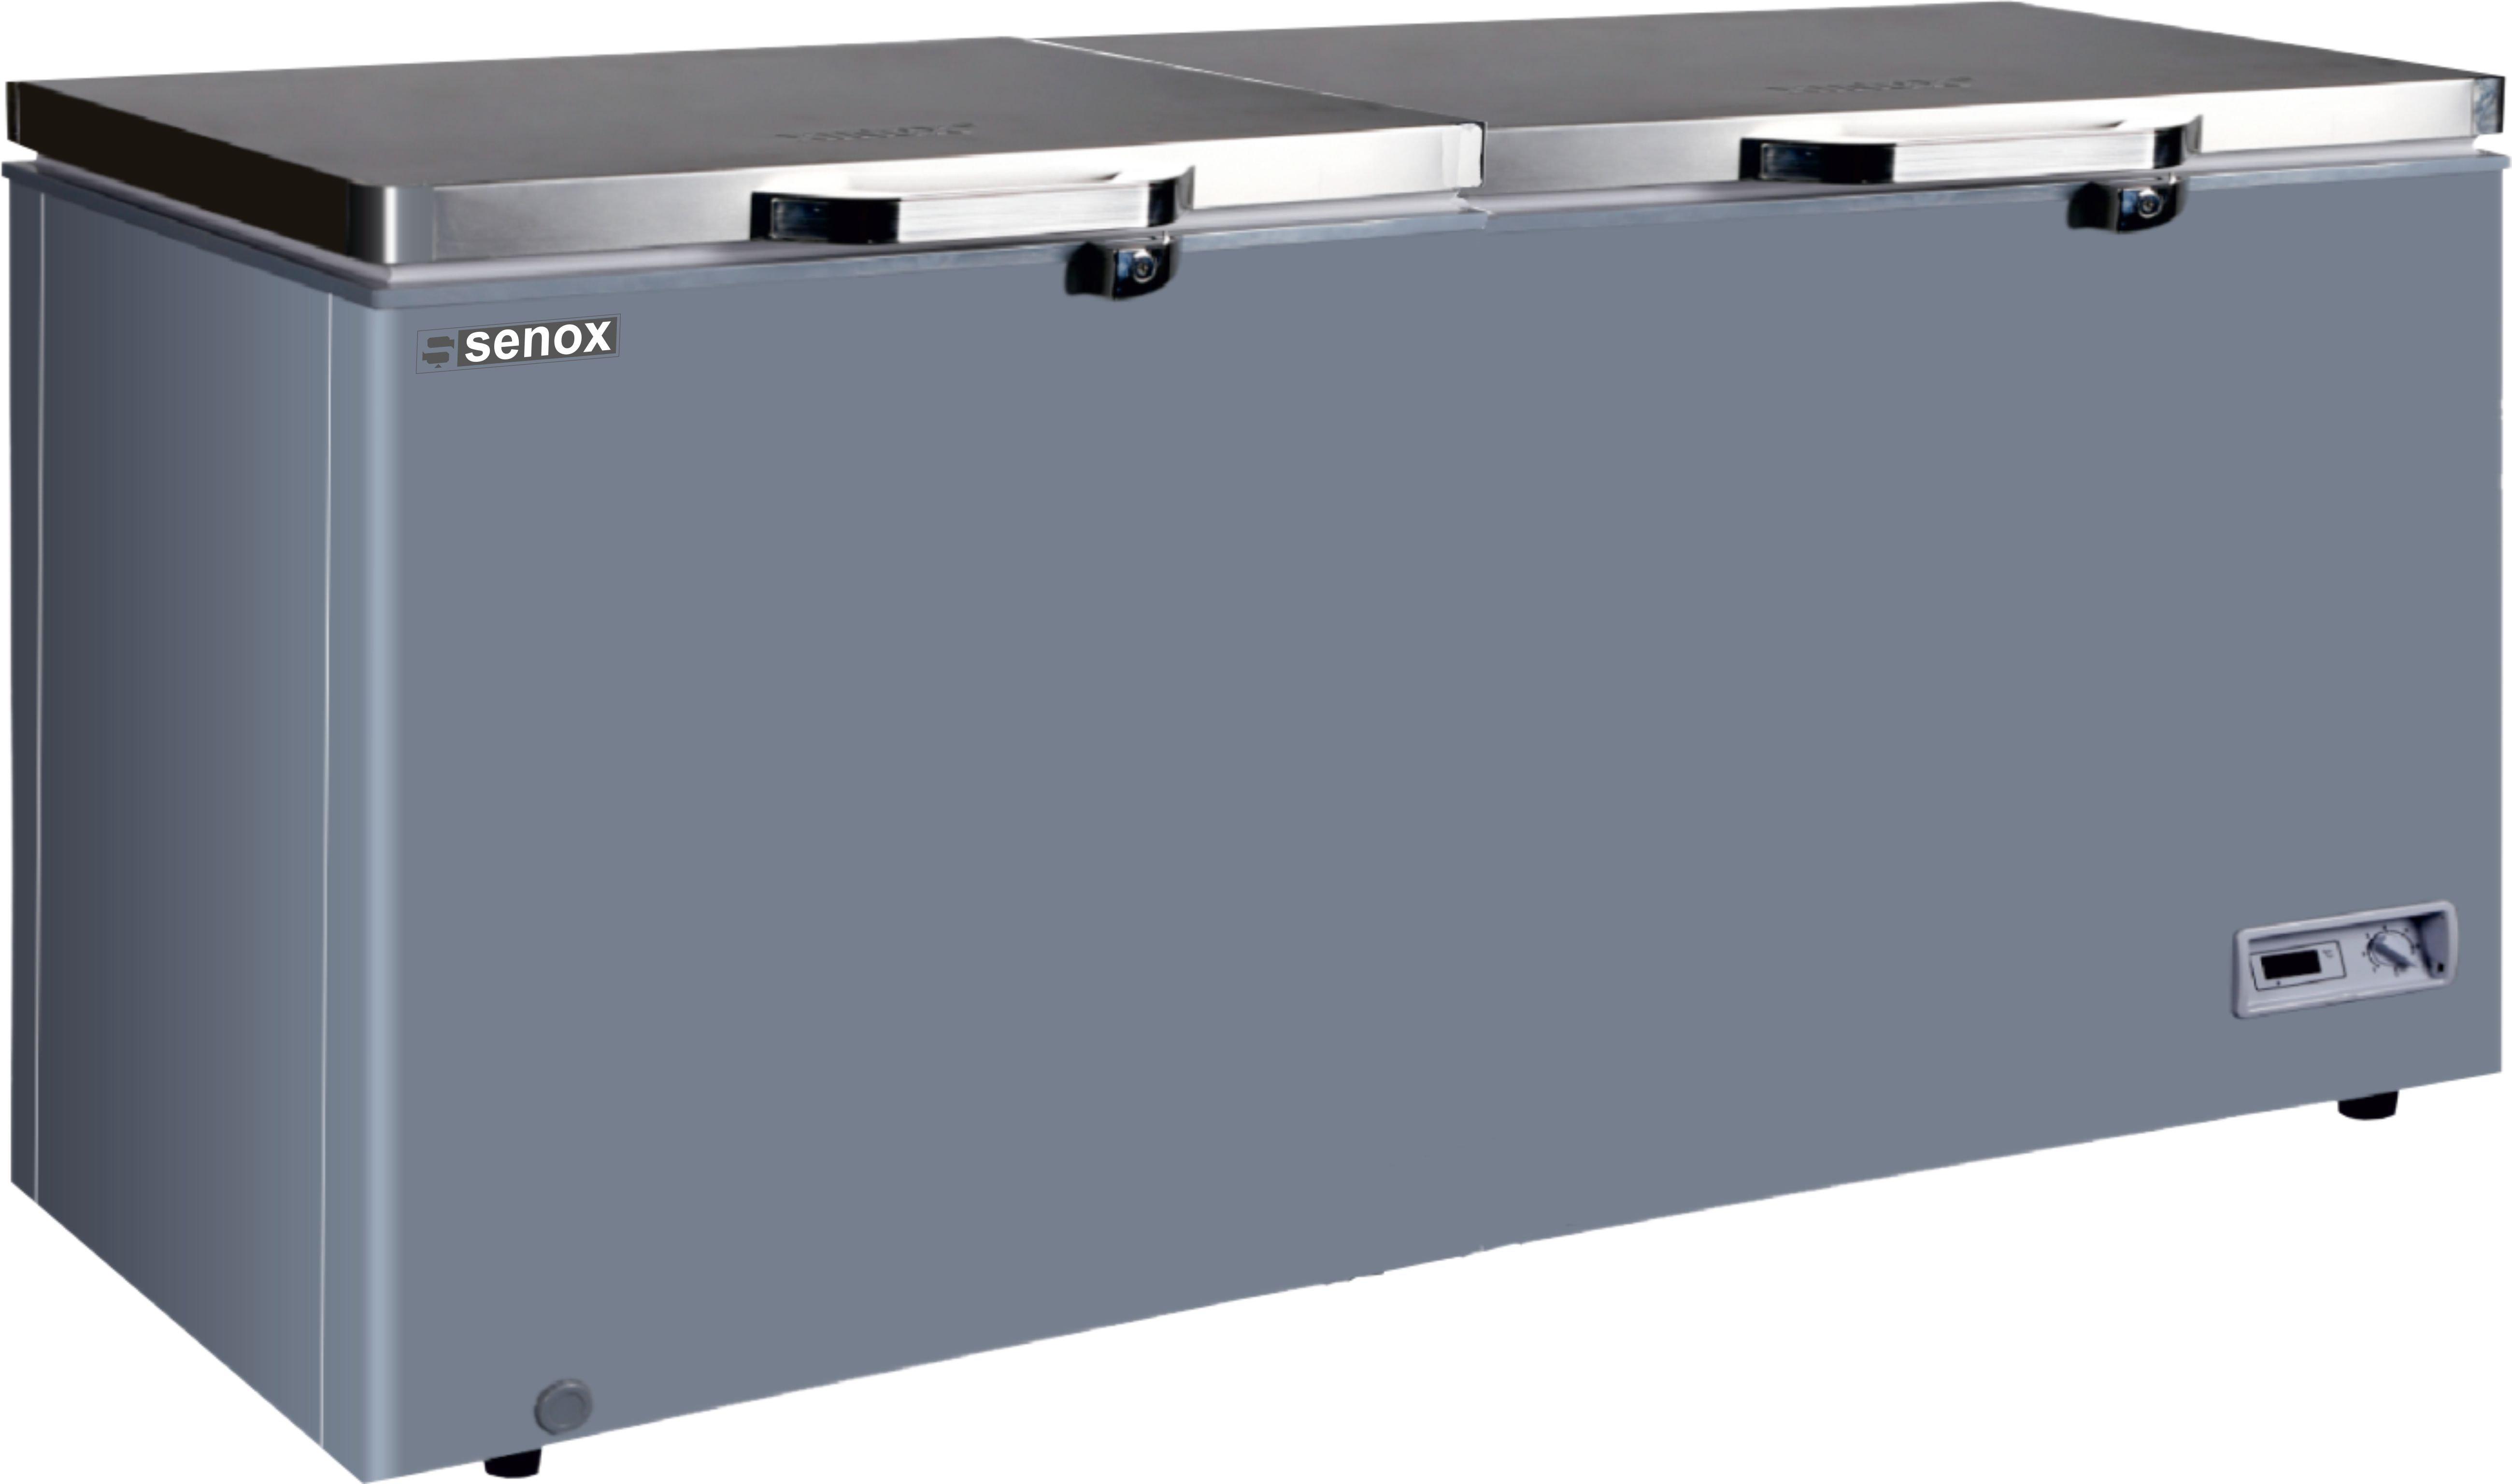 senox-bd-600